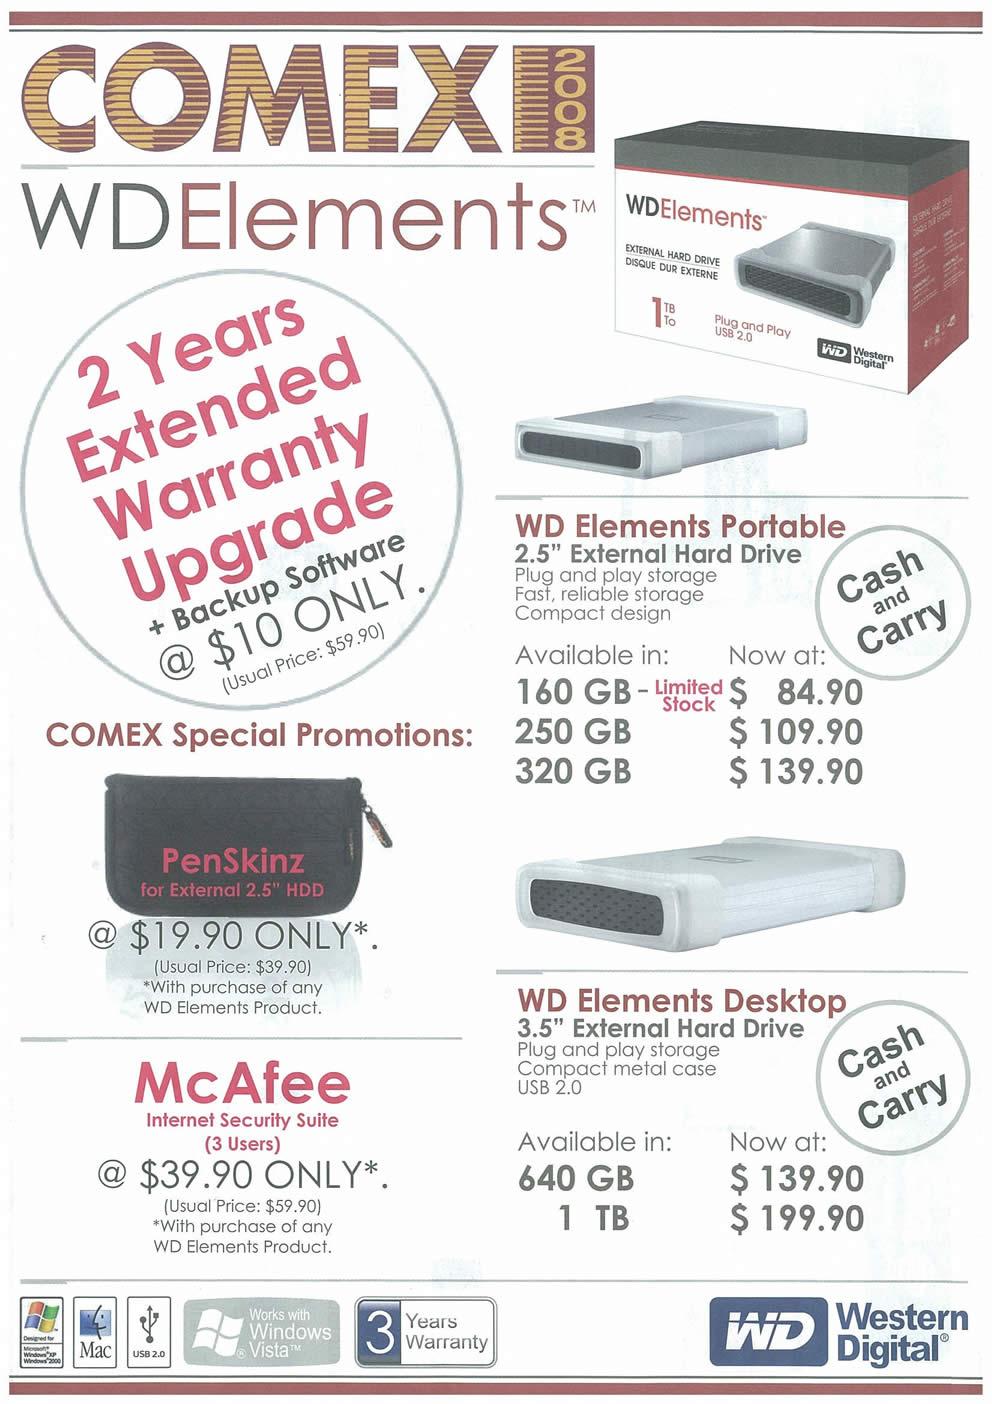 Comex 2008 price list image brochure of Western Digital Elements